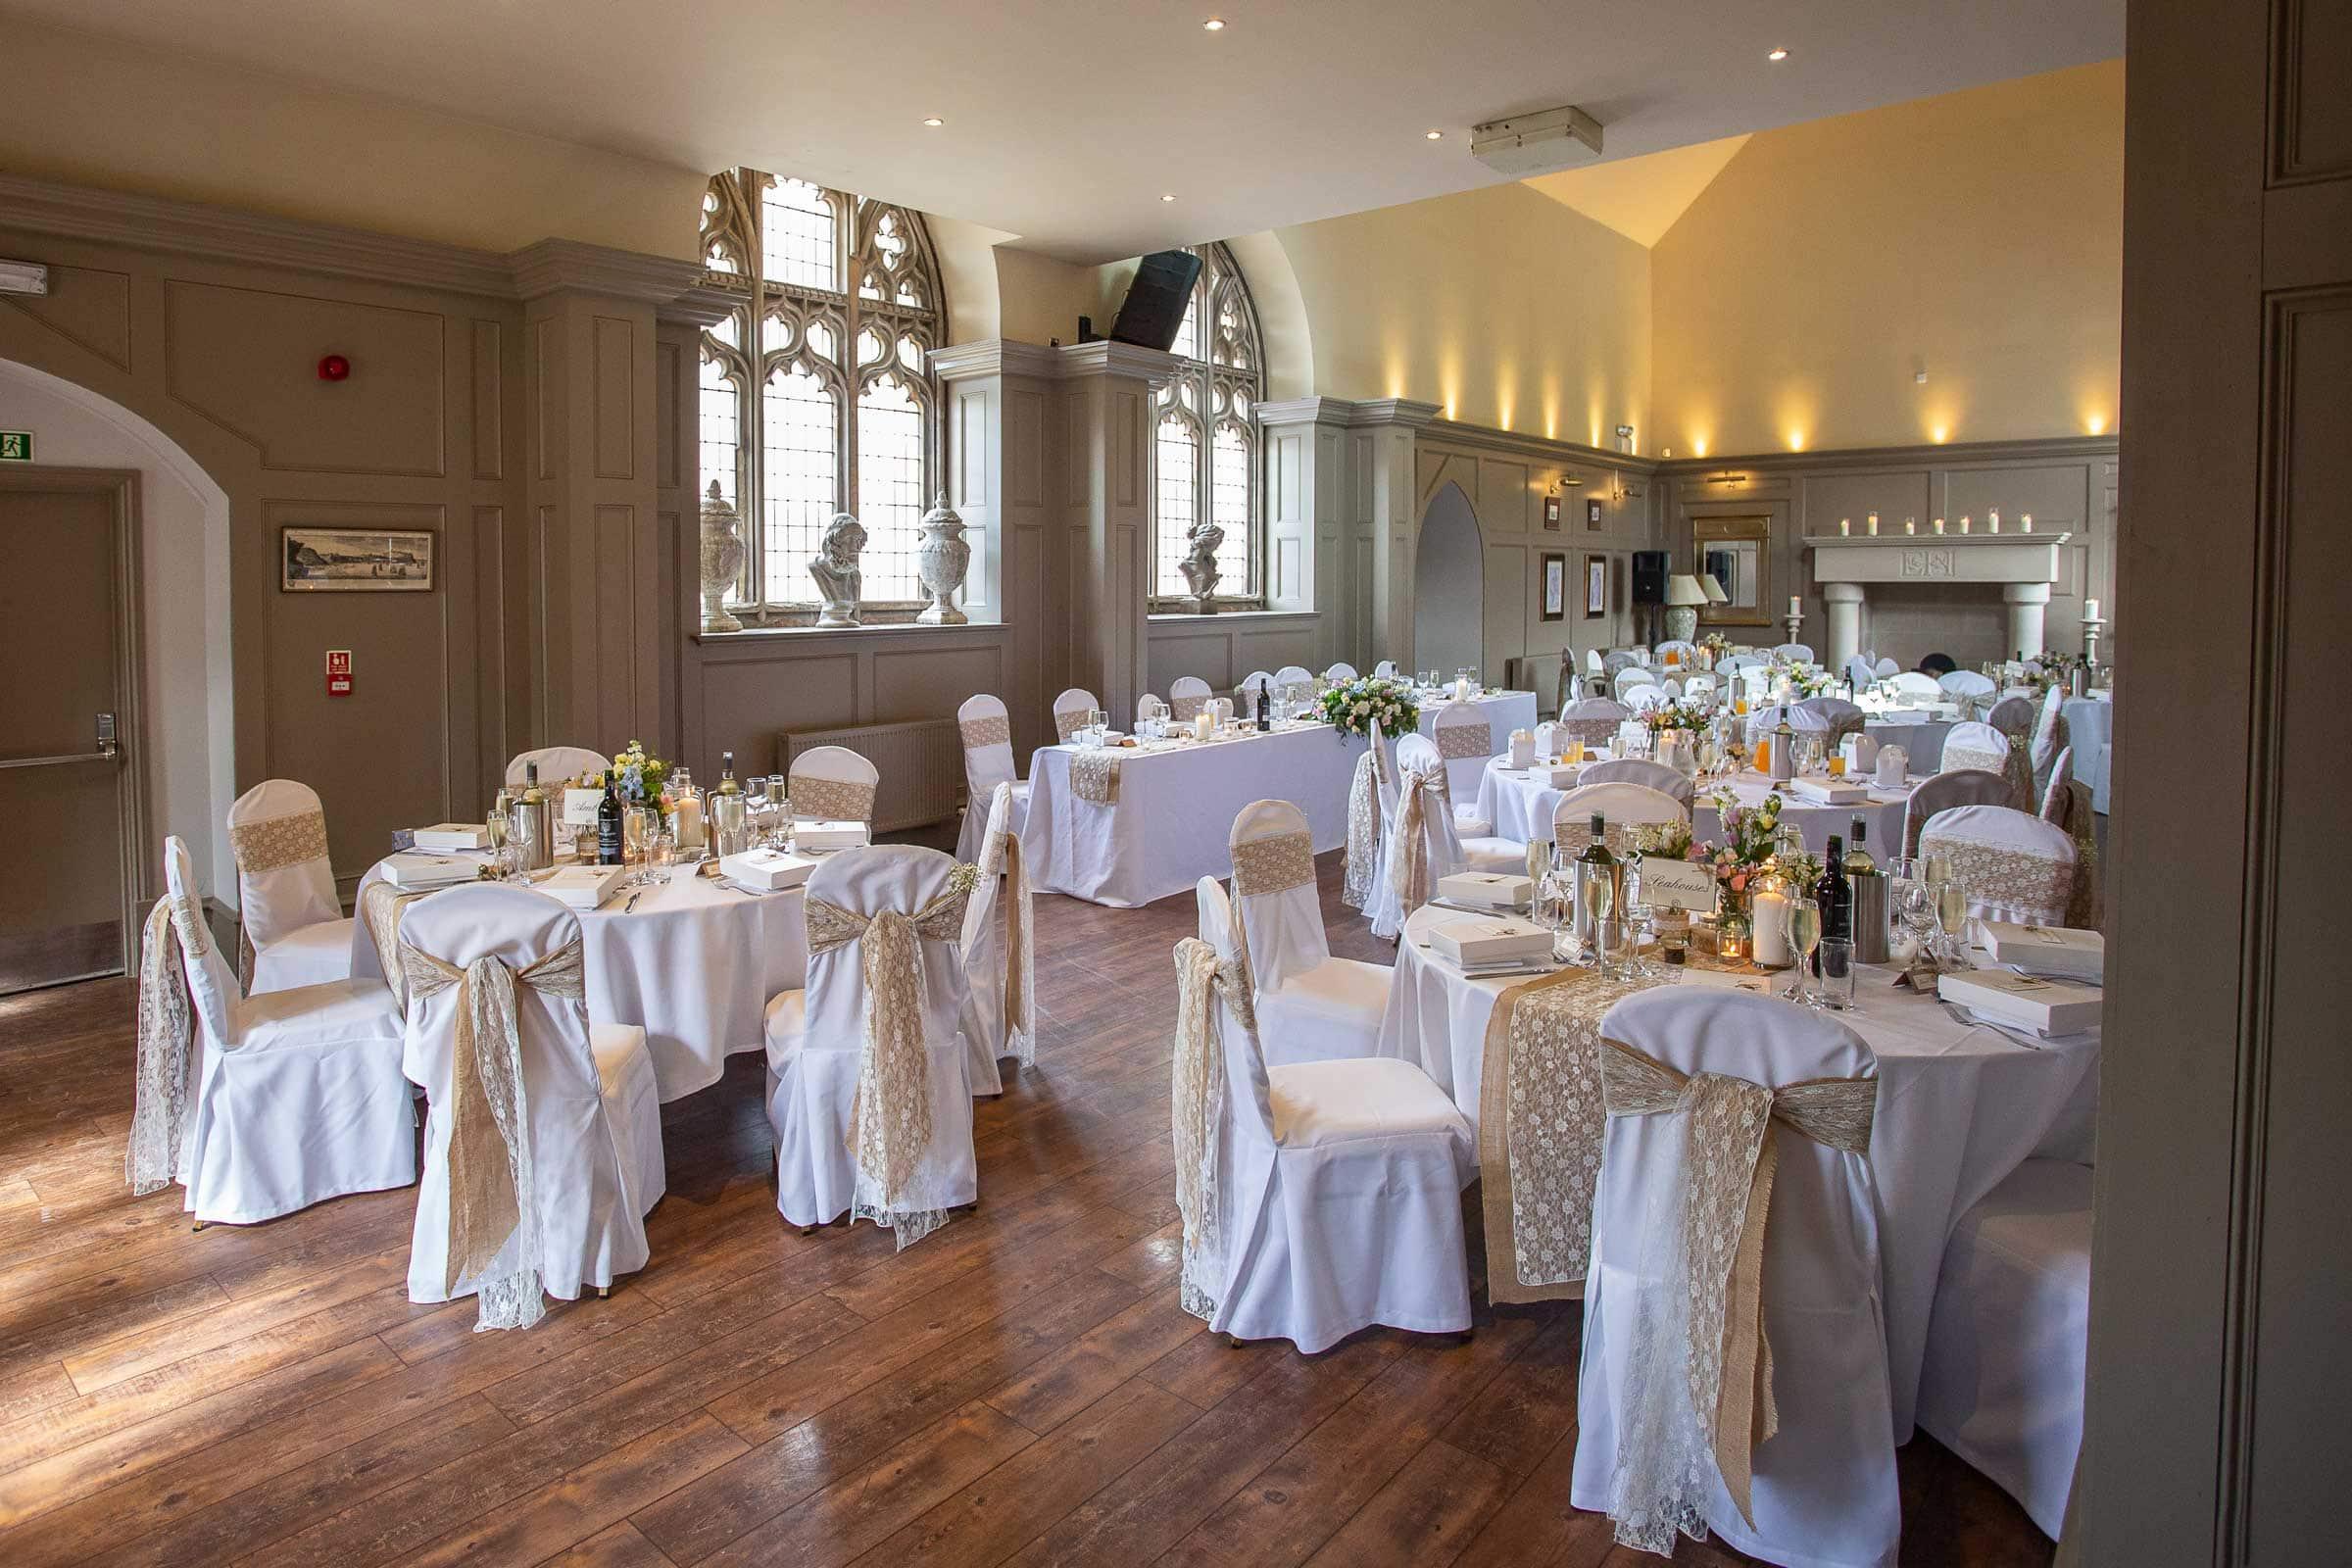 Photo of the wedding reception room at Ellingham Hall